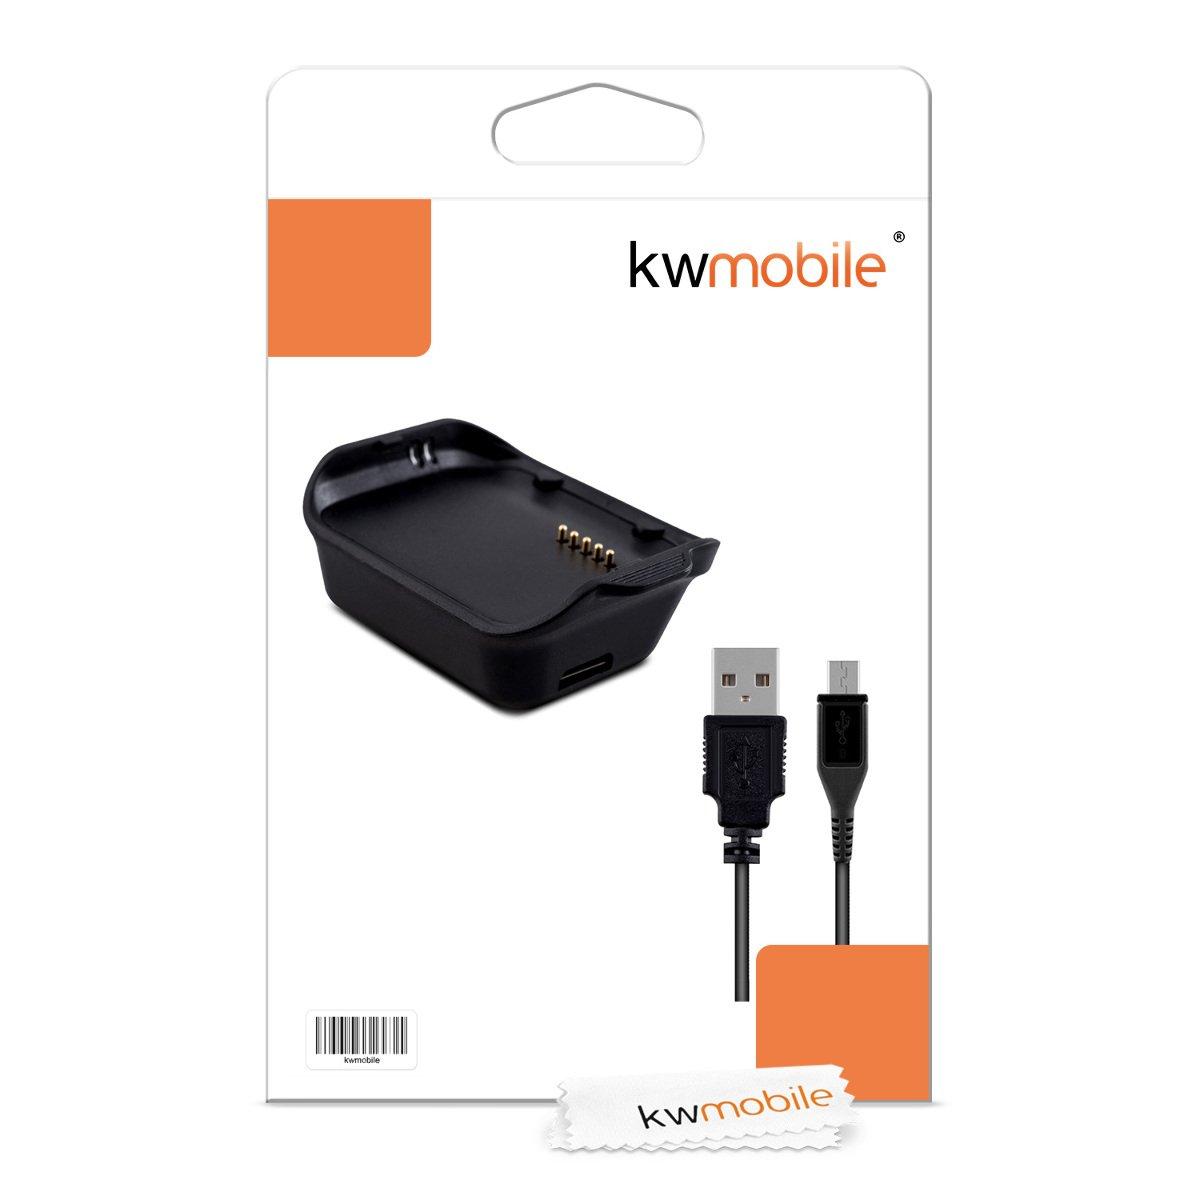 kwmobile Cable de Carga para Samsung Gear 2 R380 Conector con para Fitness Tracker y smartwatch Base de conexi/ón USB